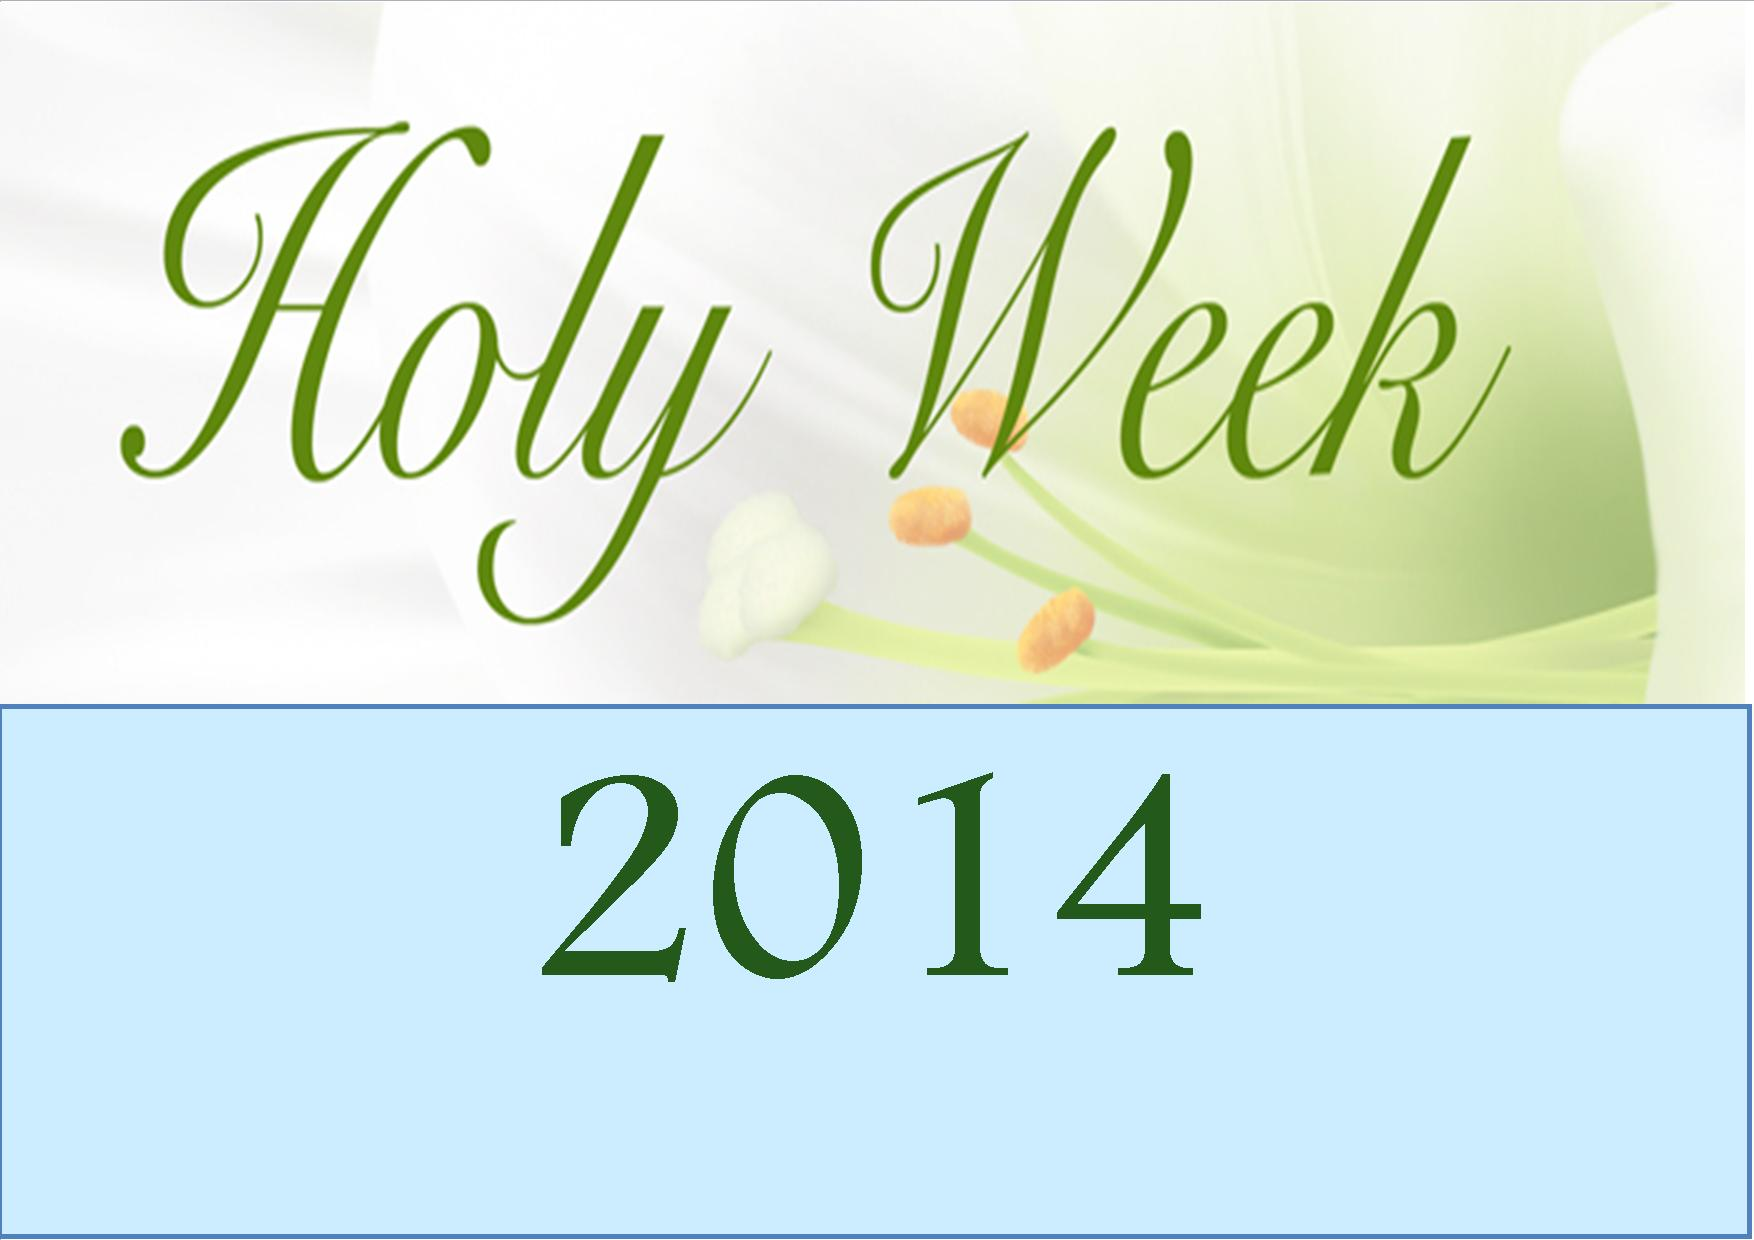 Holy Week The Easter Triduum